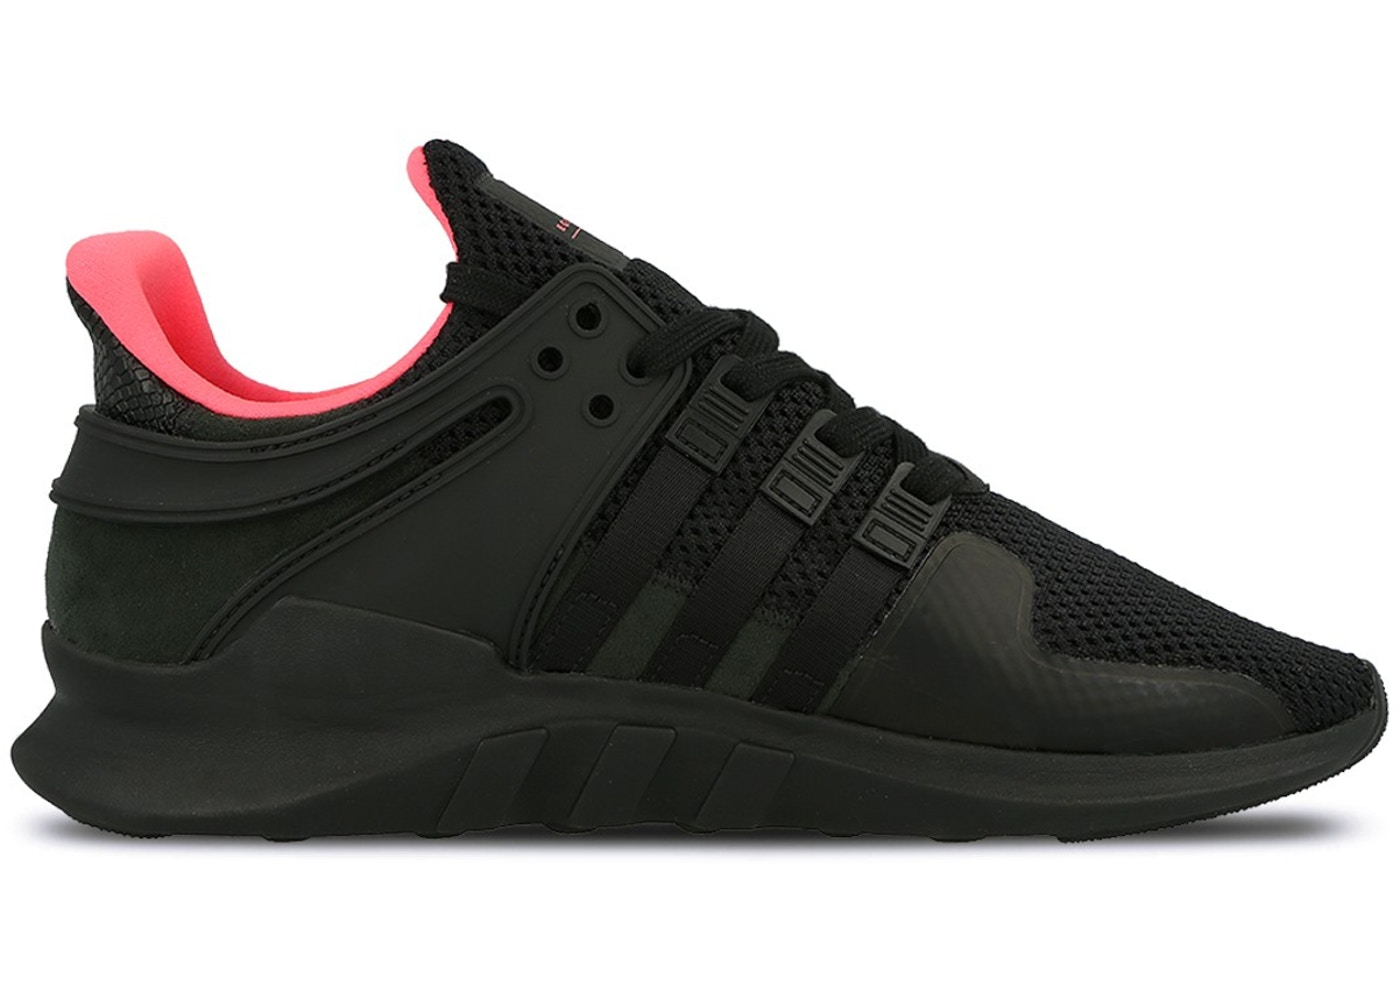 53cc9e61dc39 sneakers adidas men eqt support adv black core black turbo size 4.5 ...